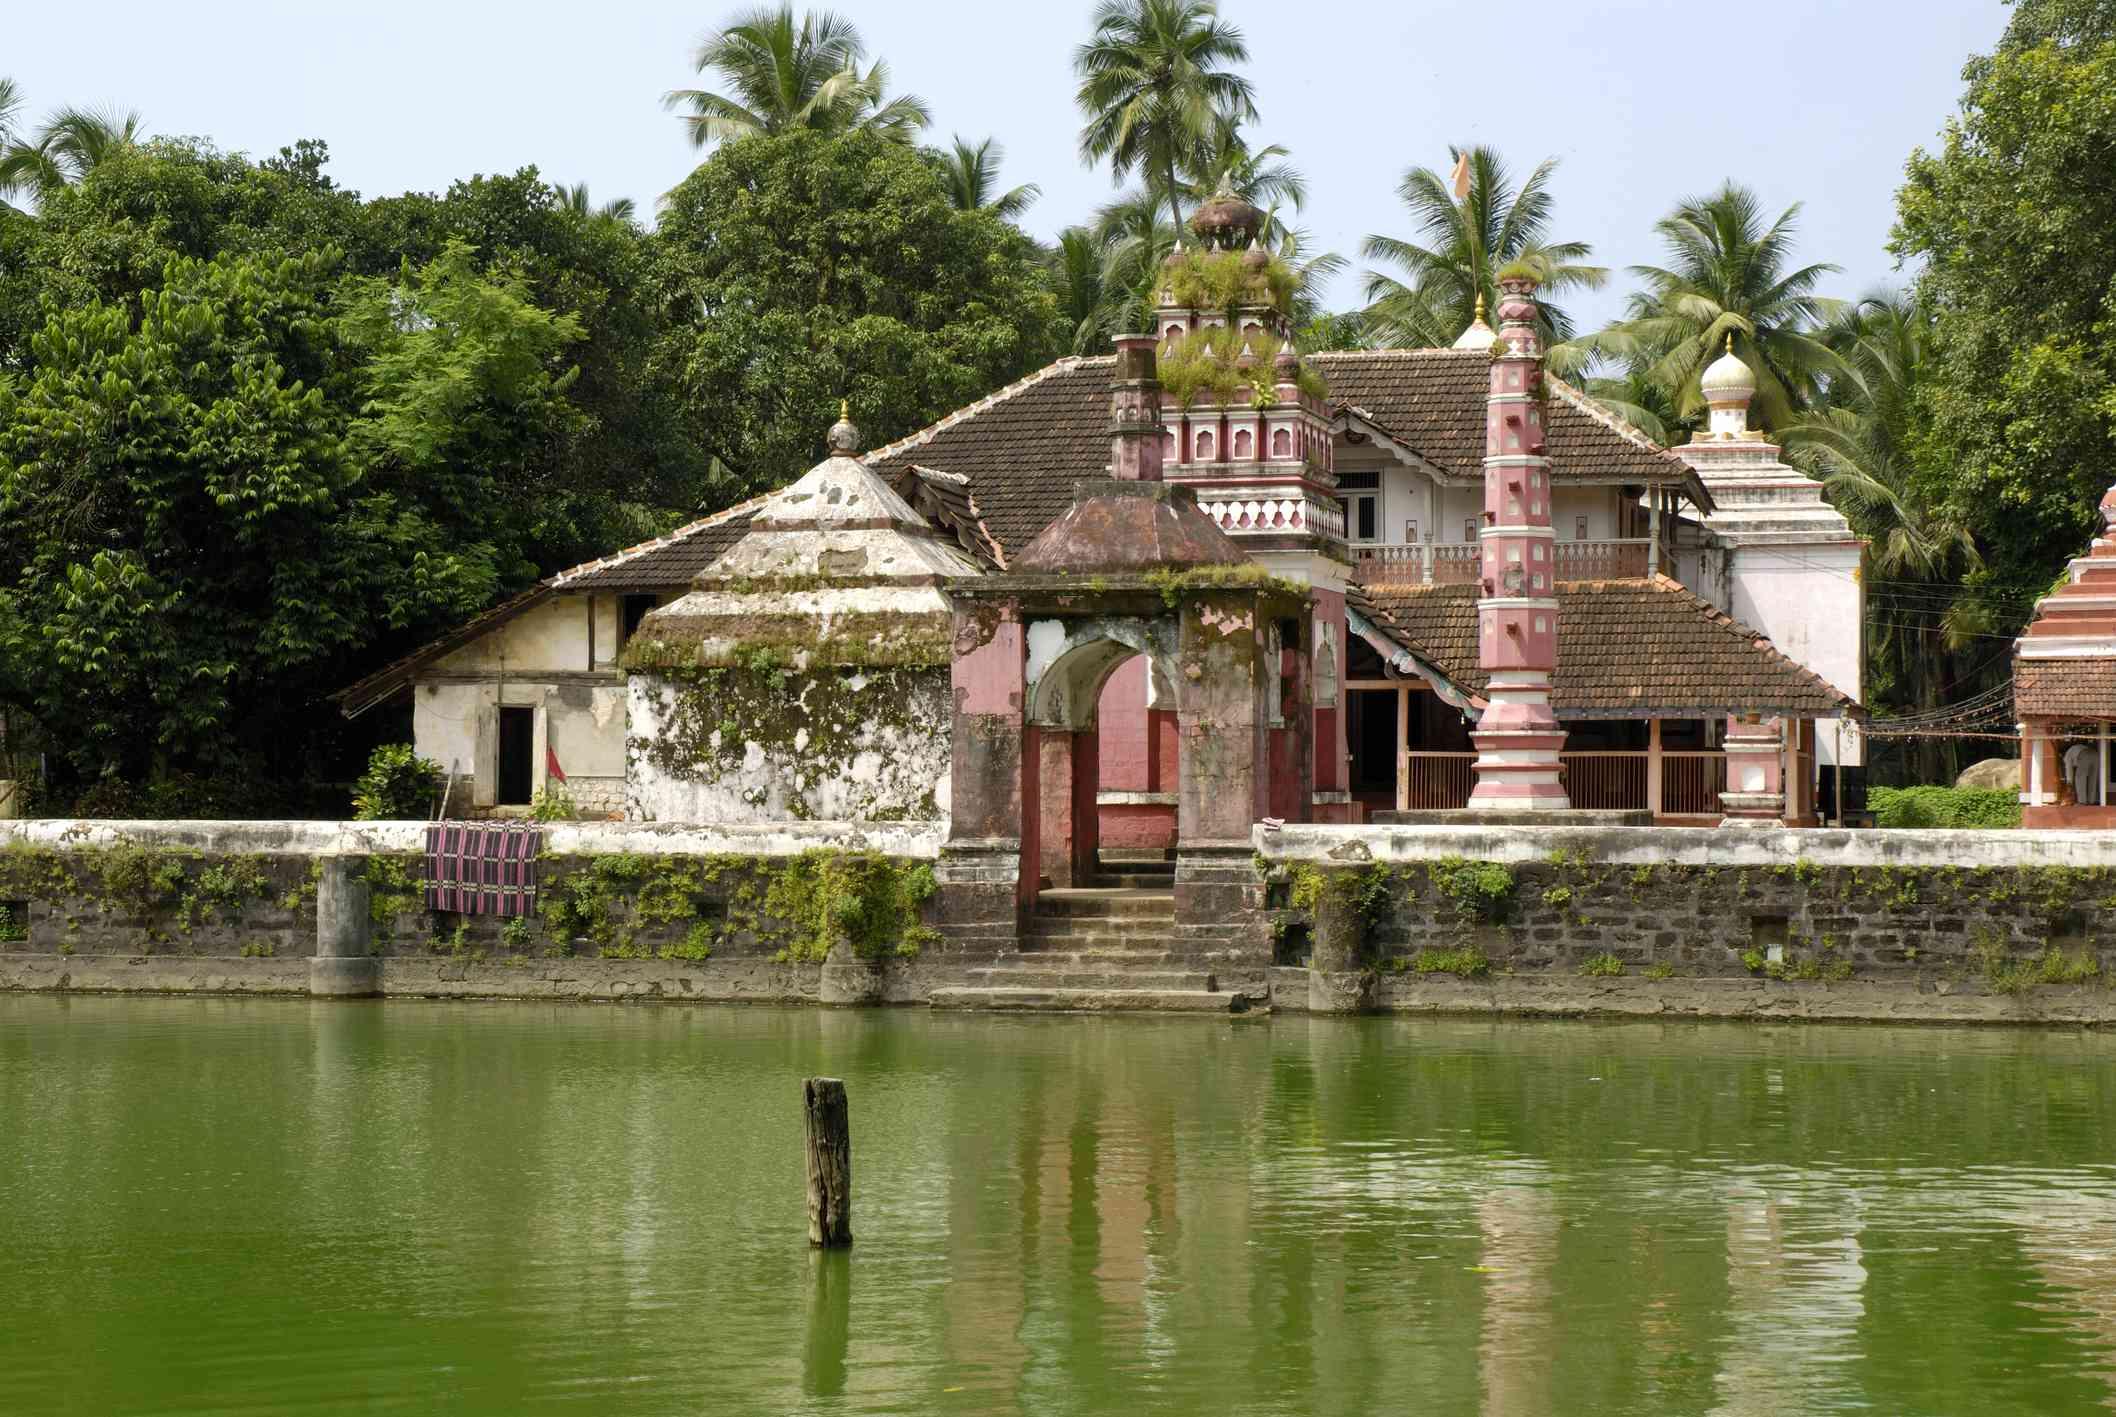 Rameshwar temple at Chaul, Alibaug